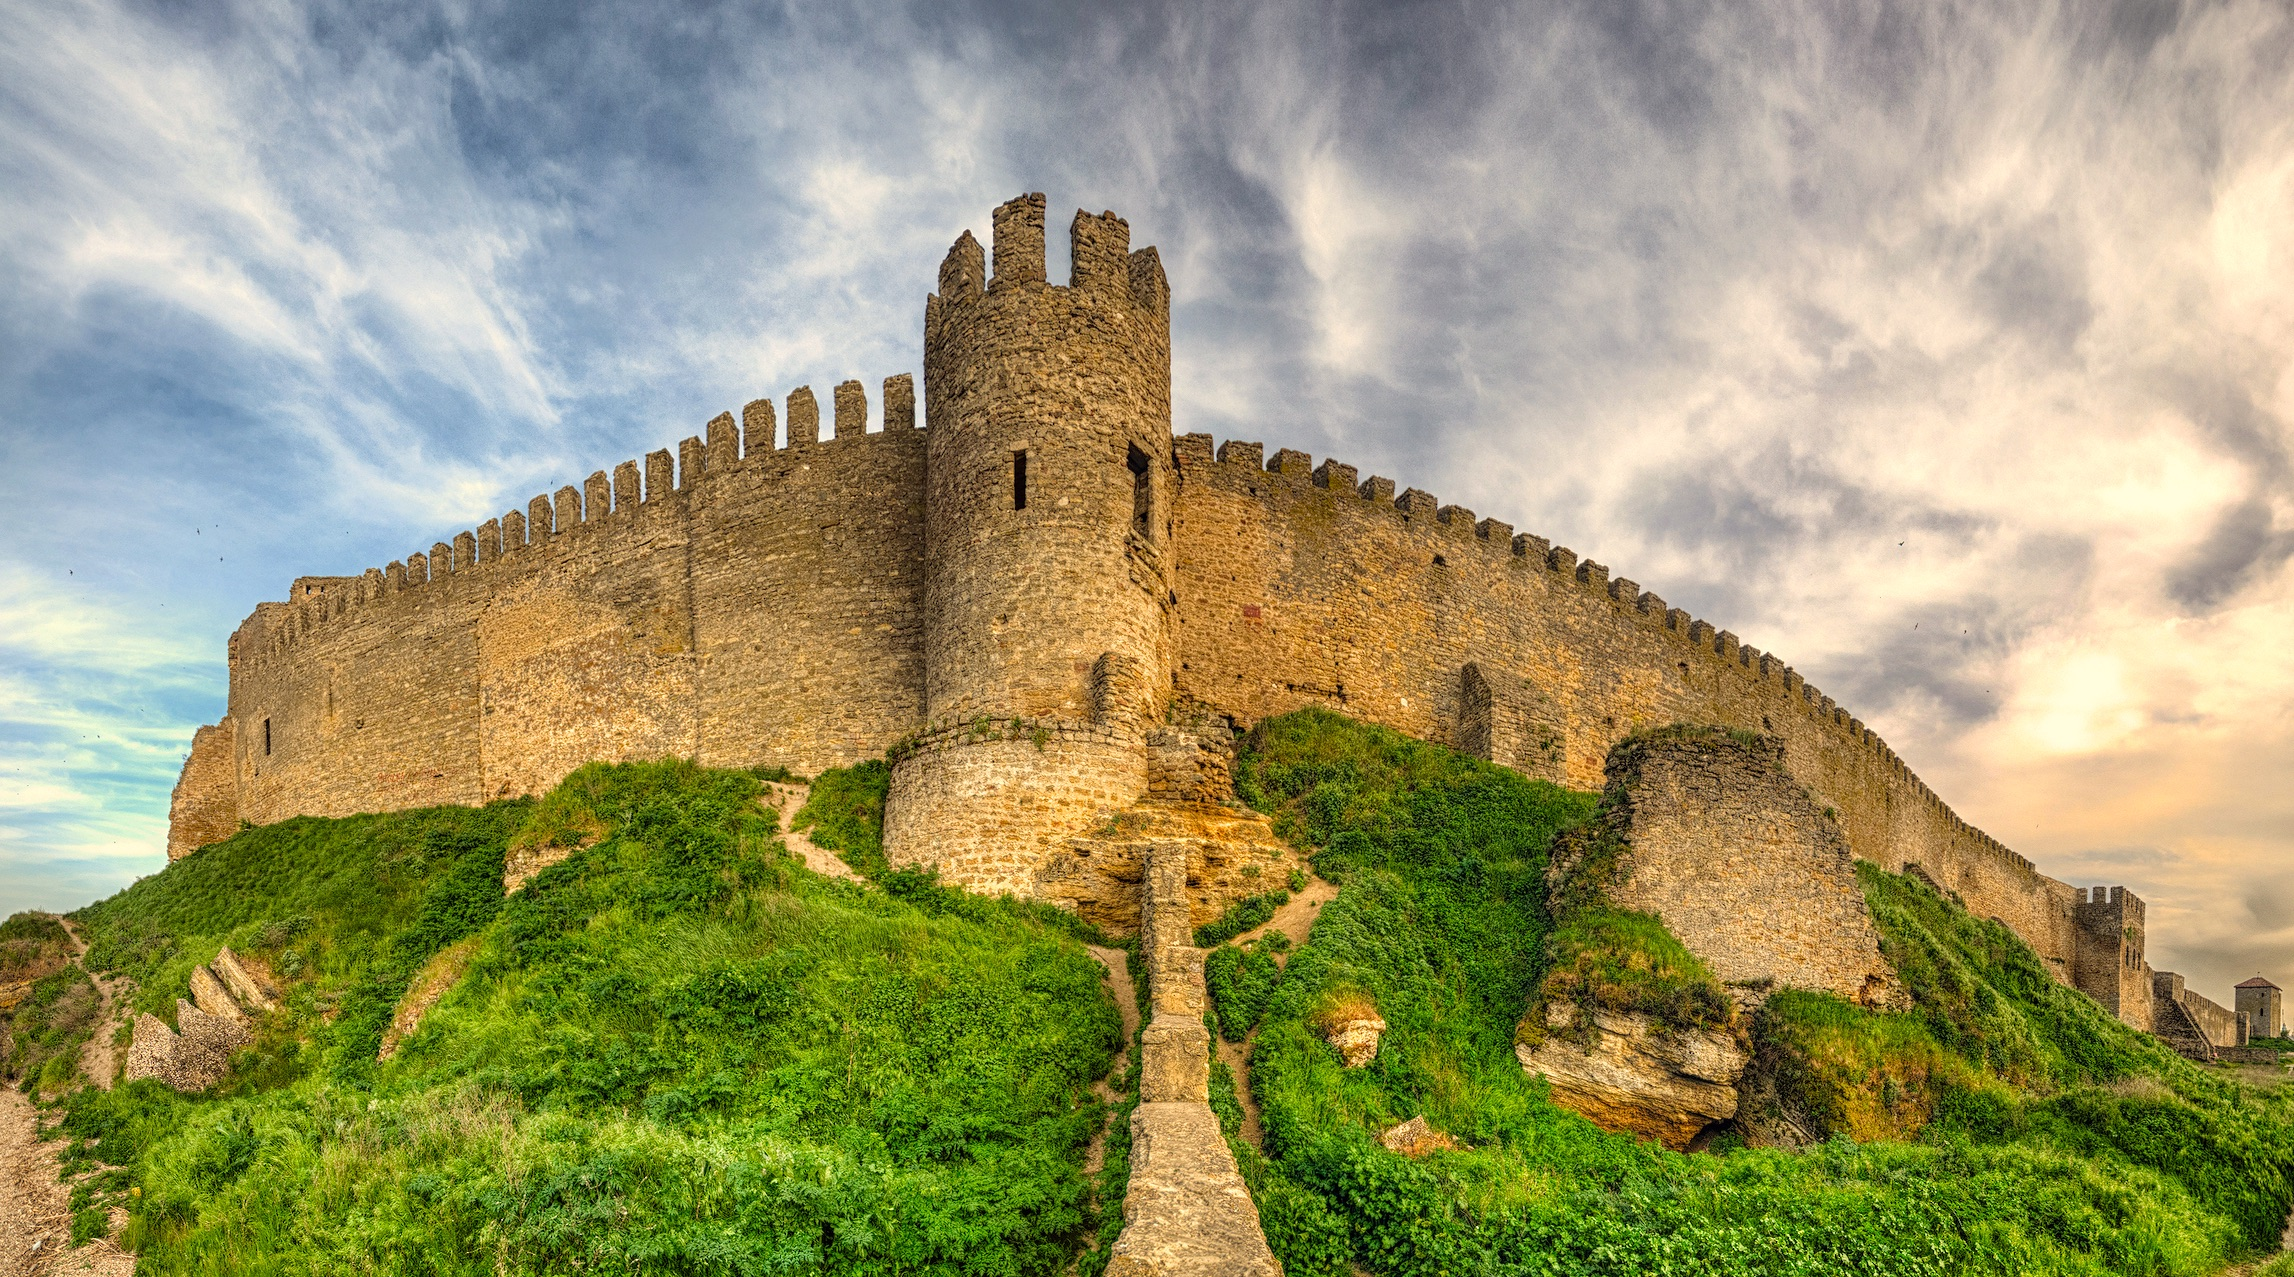 Fortress in Ukraine